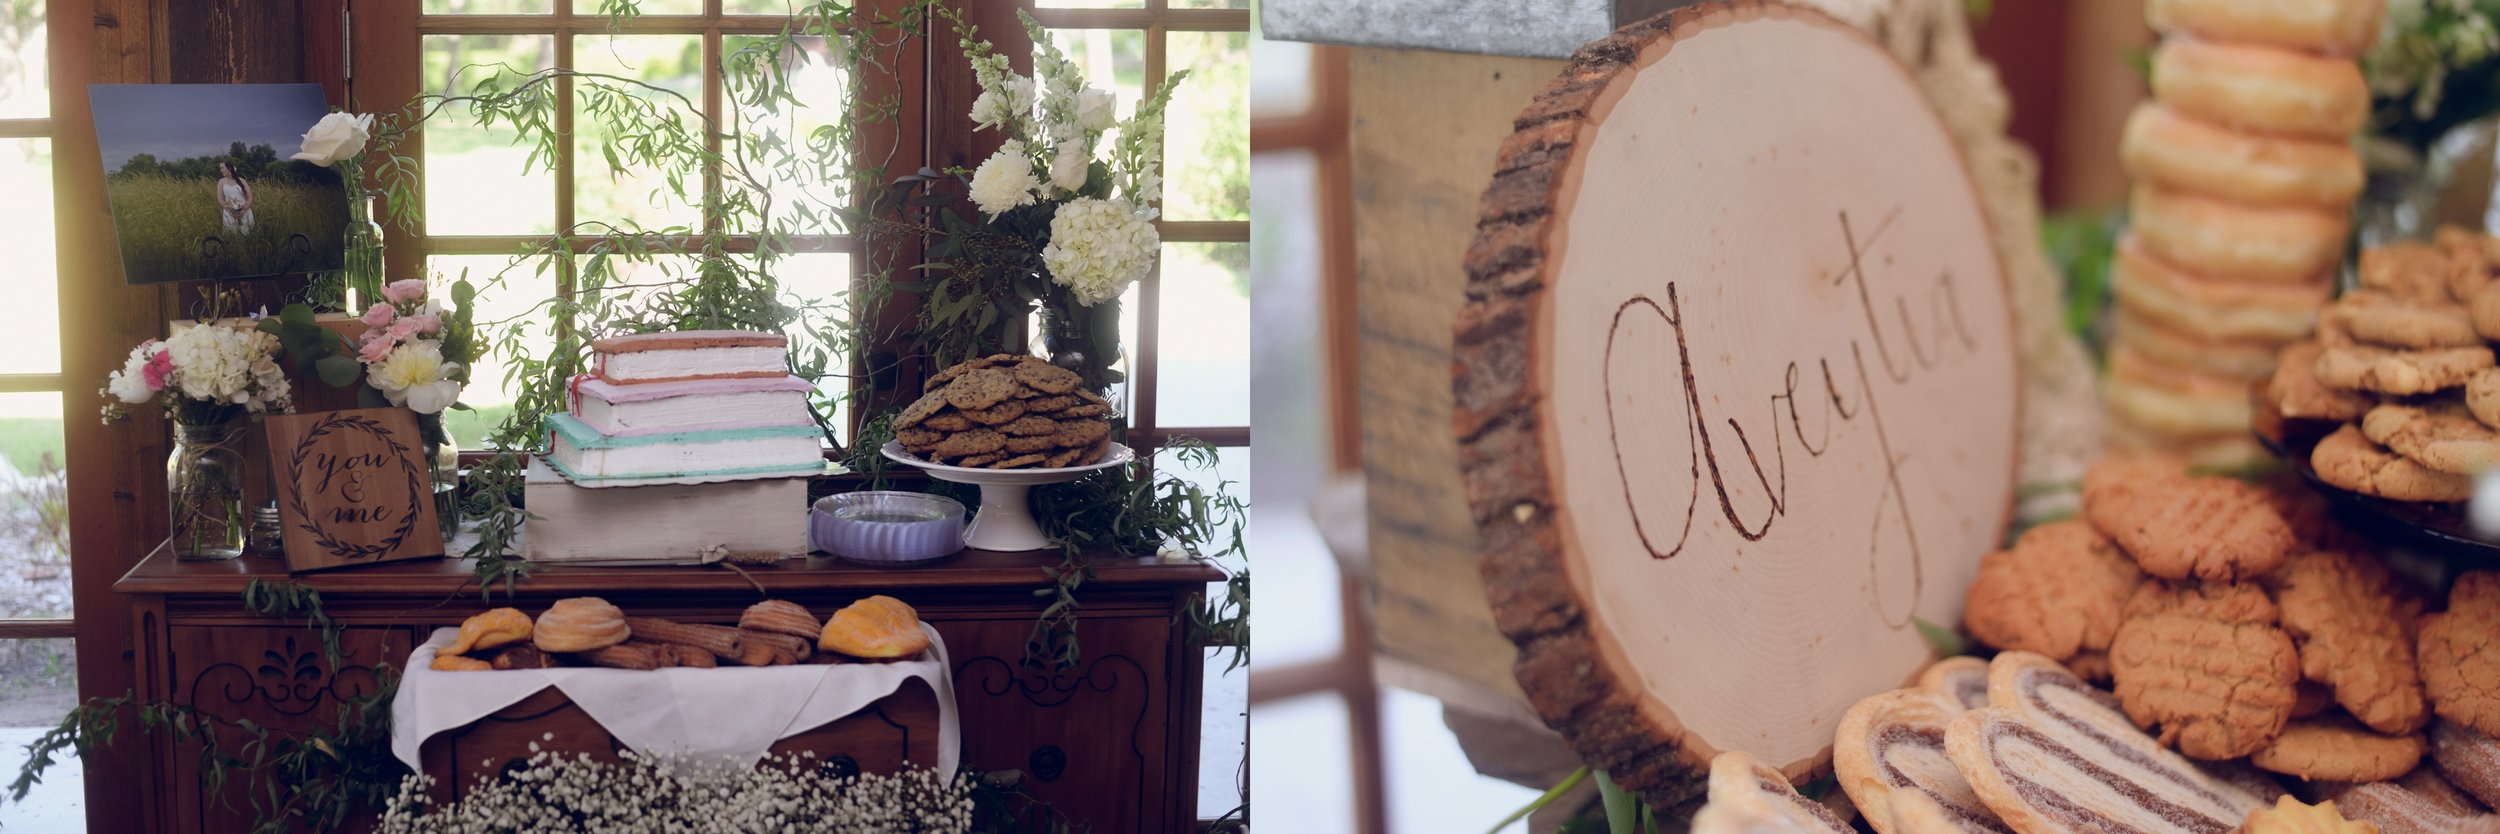 Lonestar-Mansion-Fort-Worth-Wedding-Planner-Burleson-Wedding-Venue_23.jpg